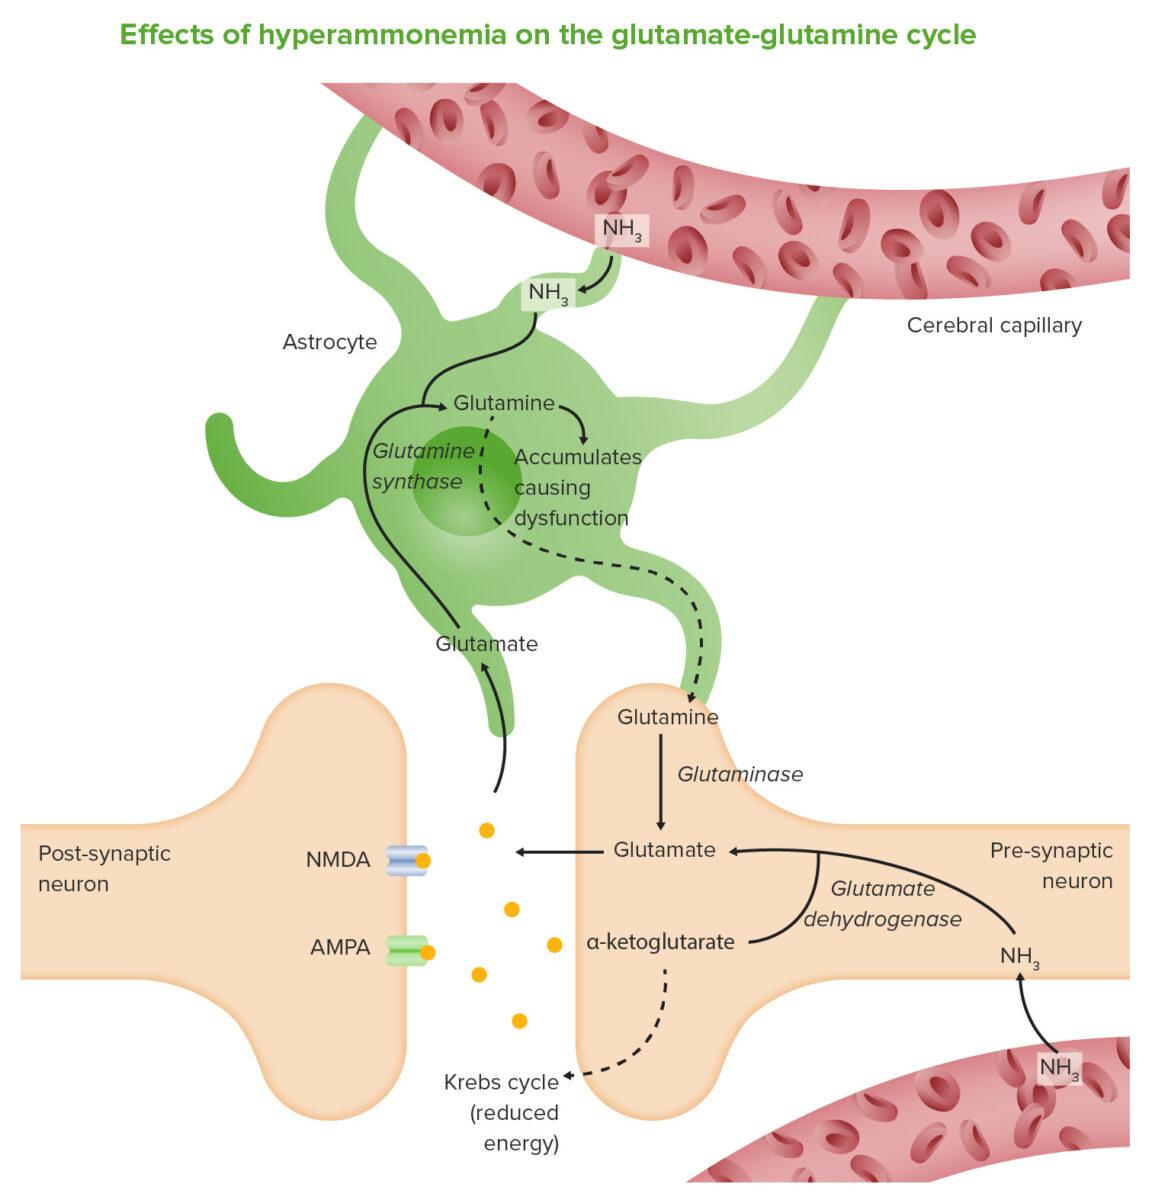 Effects of hyperammonemia on the glutamate-glutamine cycle